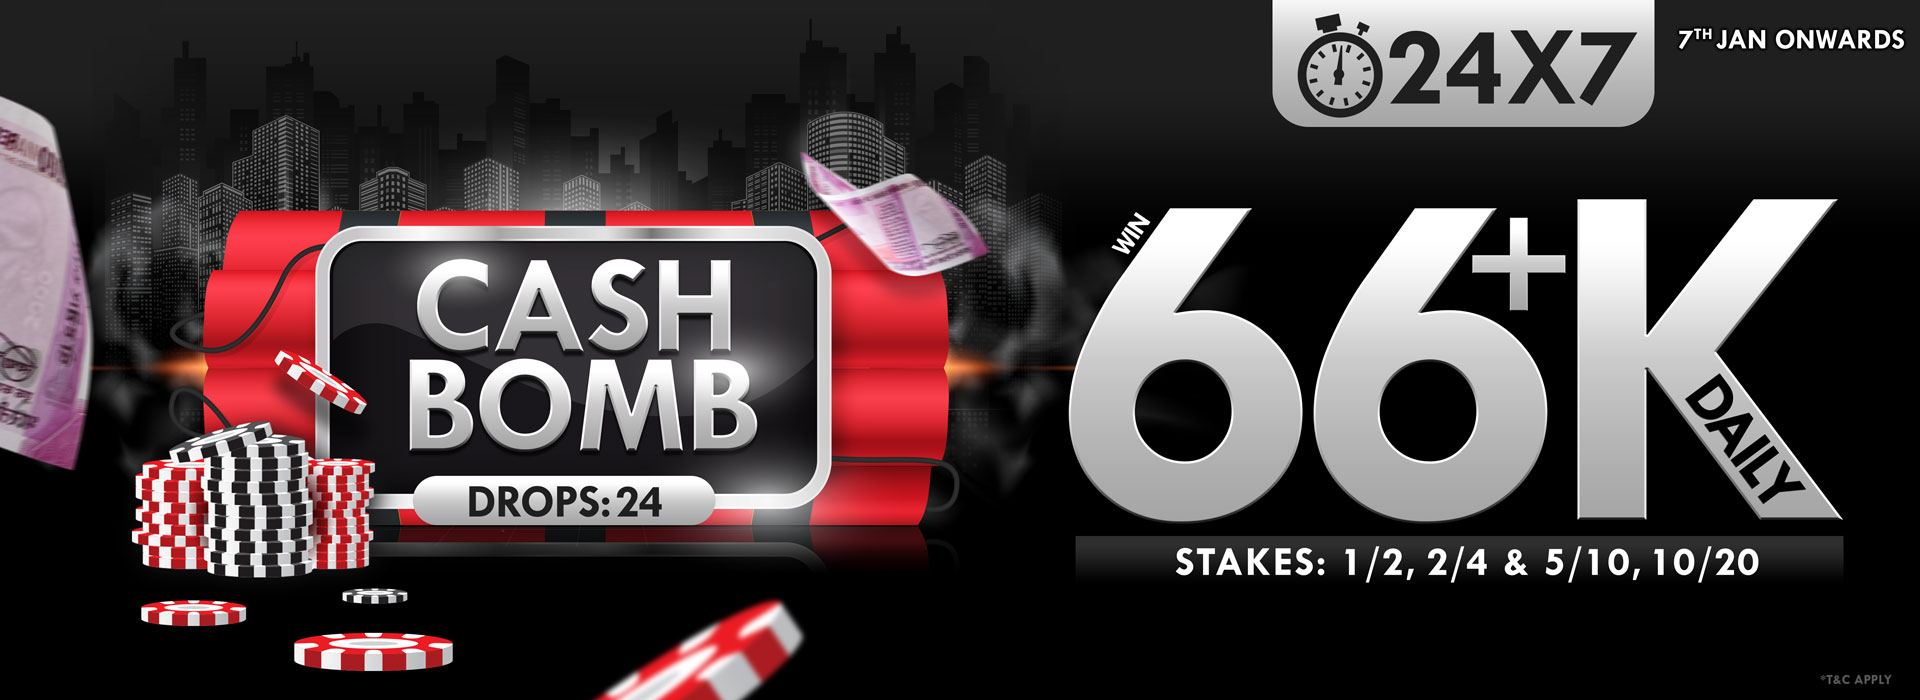 Cash Bomb 2020